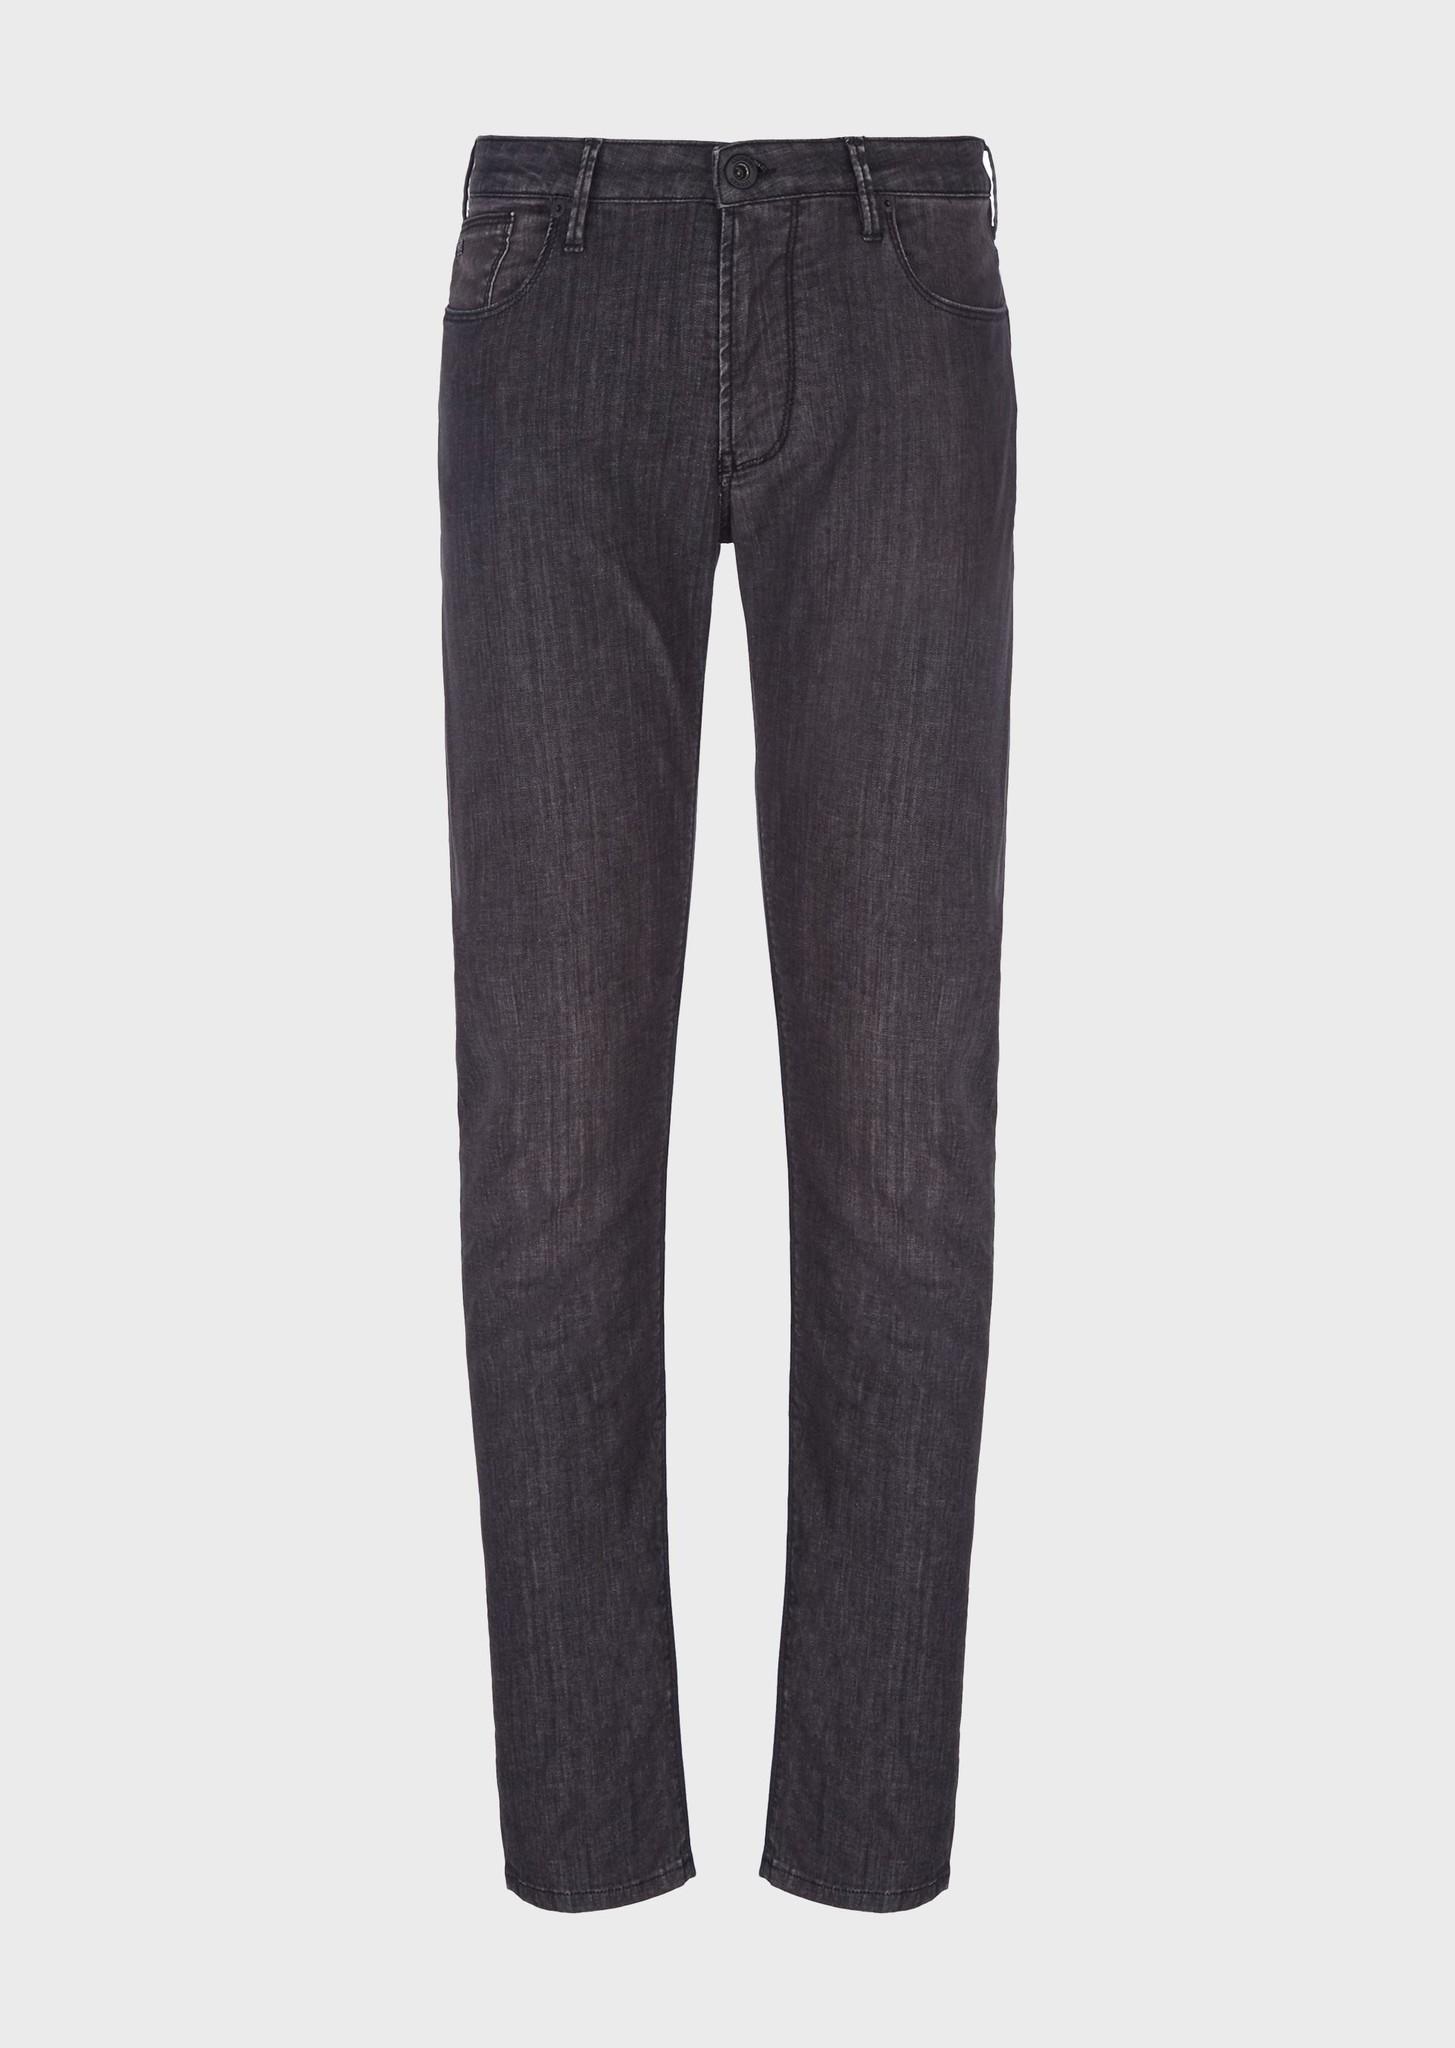 J75 Slim Fit Jeans-1